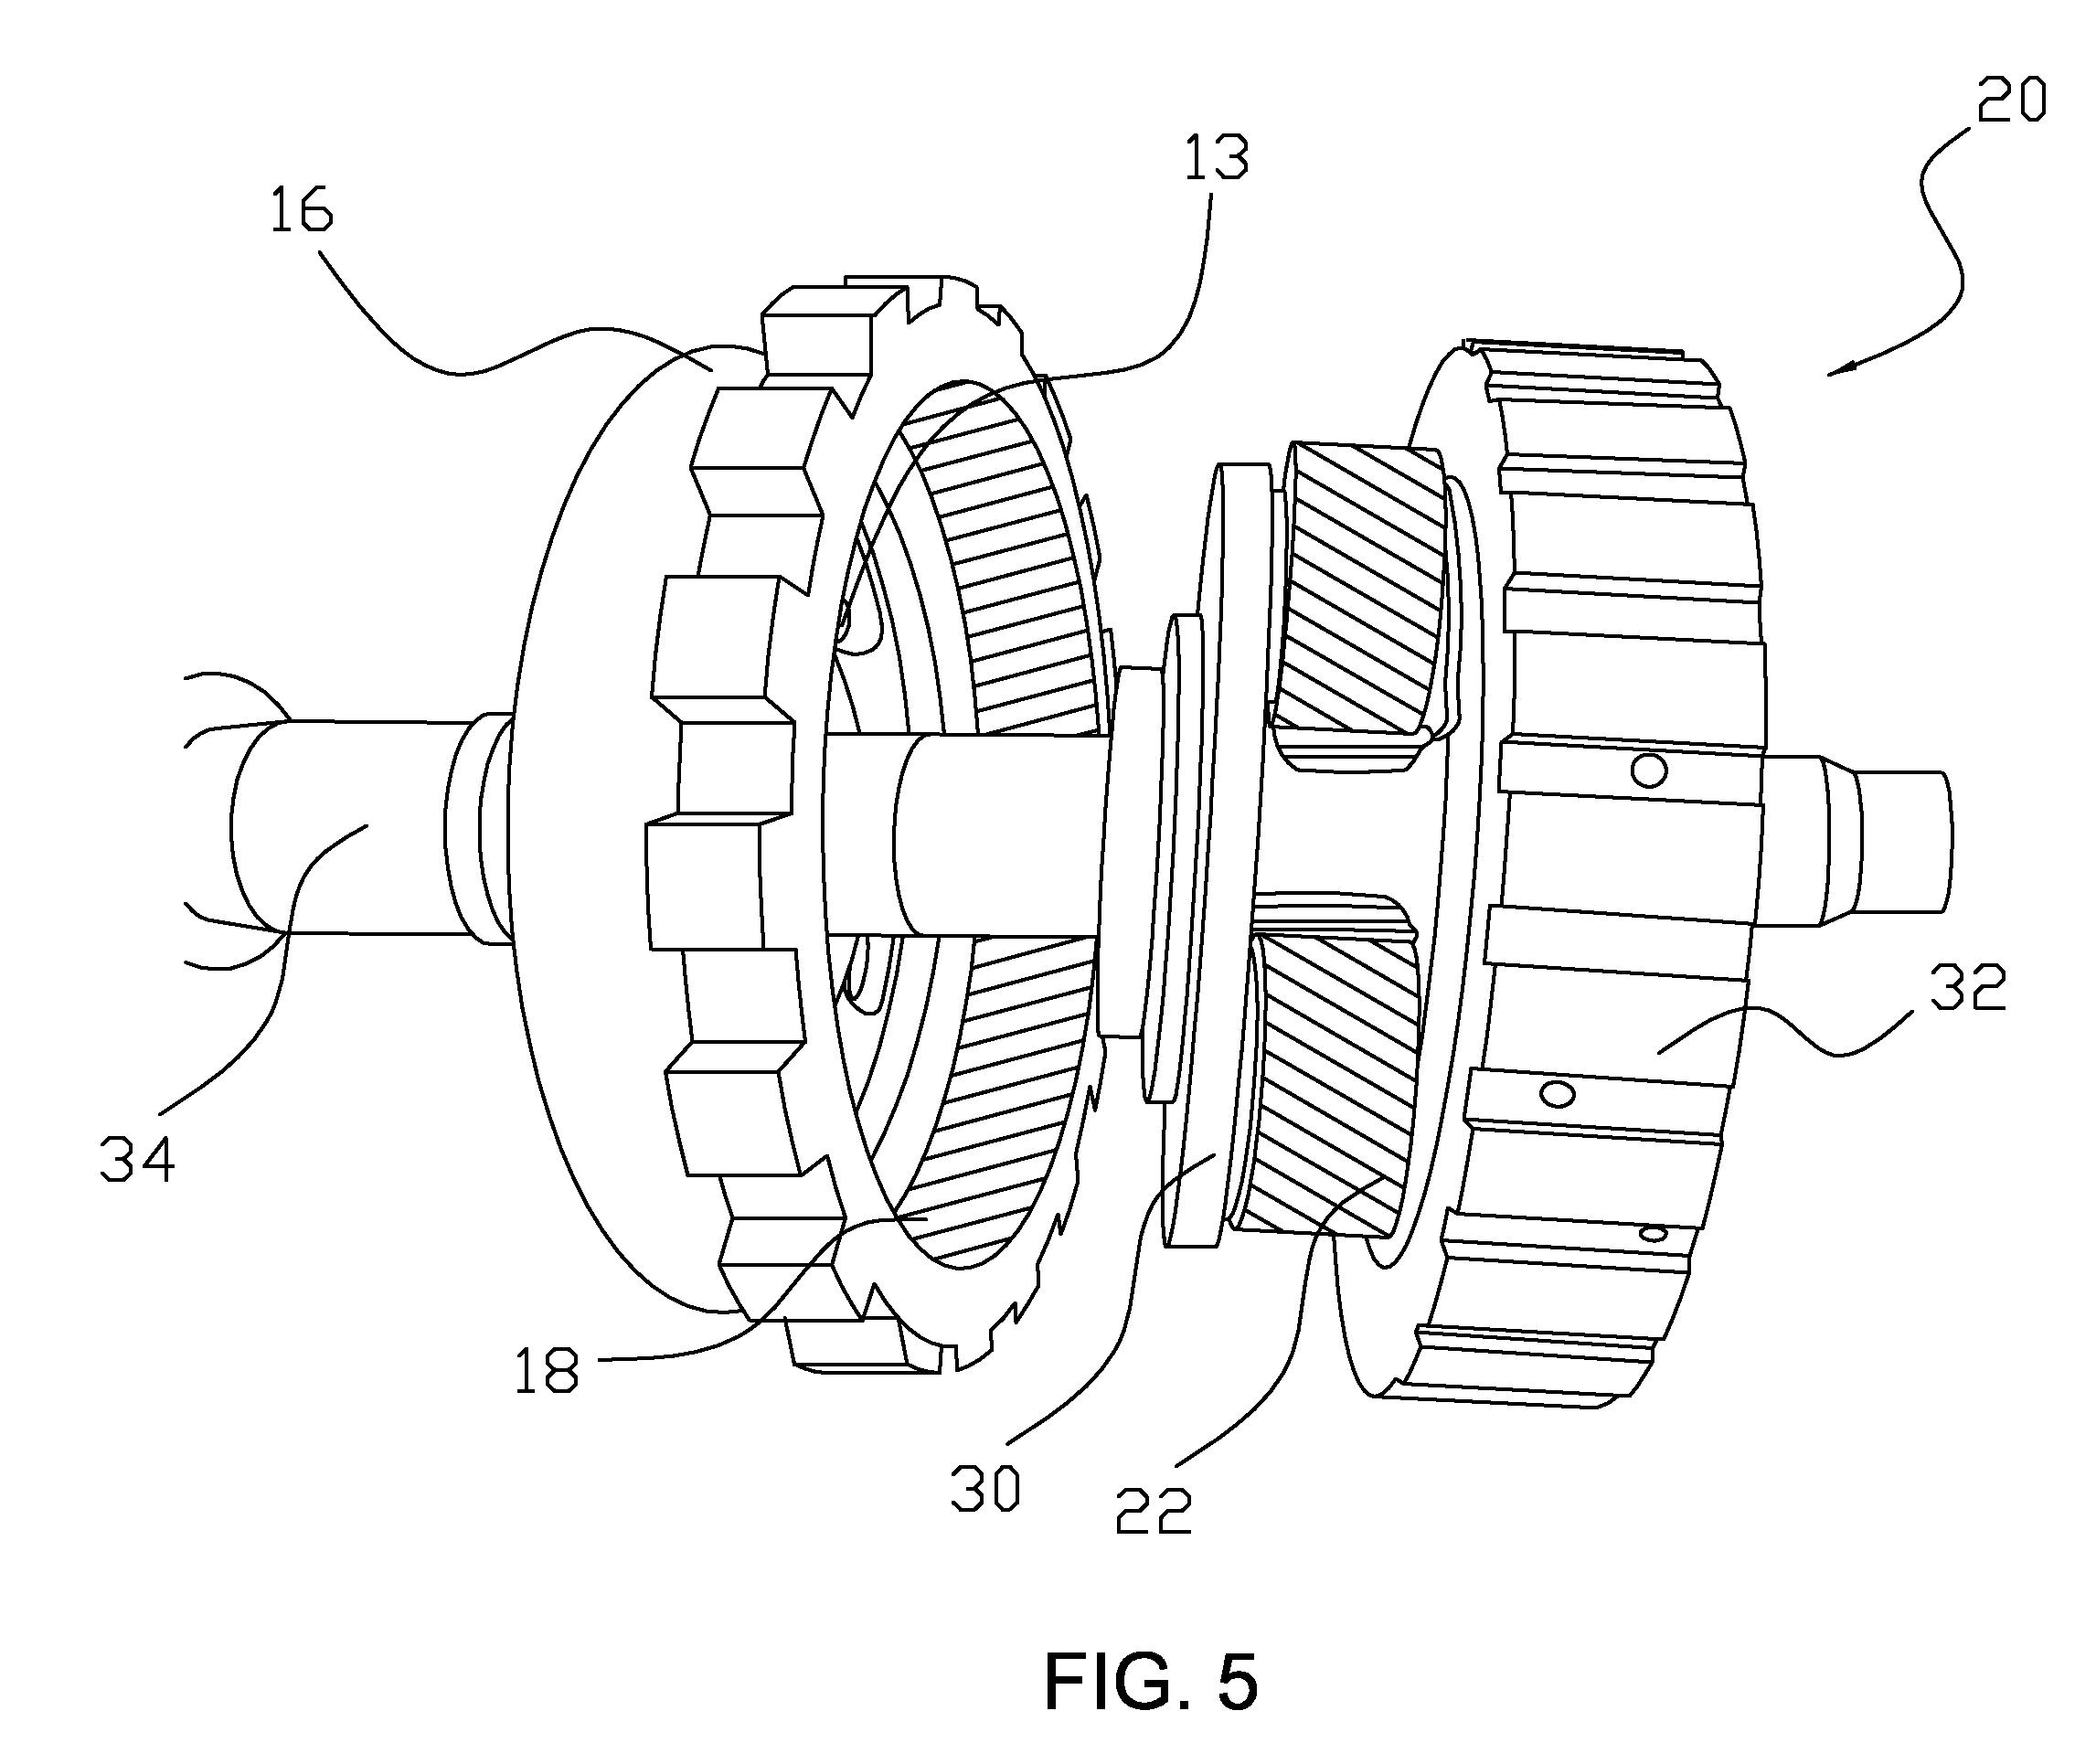 m30 transmission parts diagram  m30  free engine image for